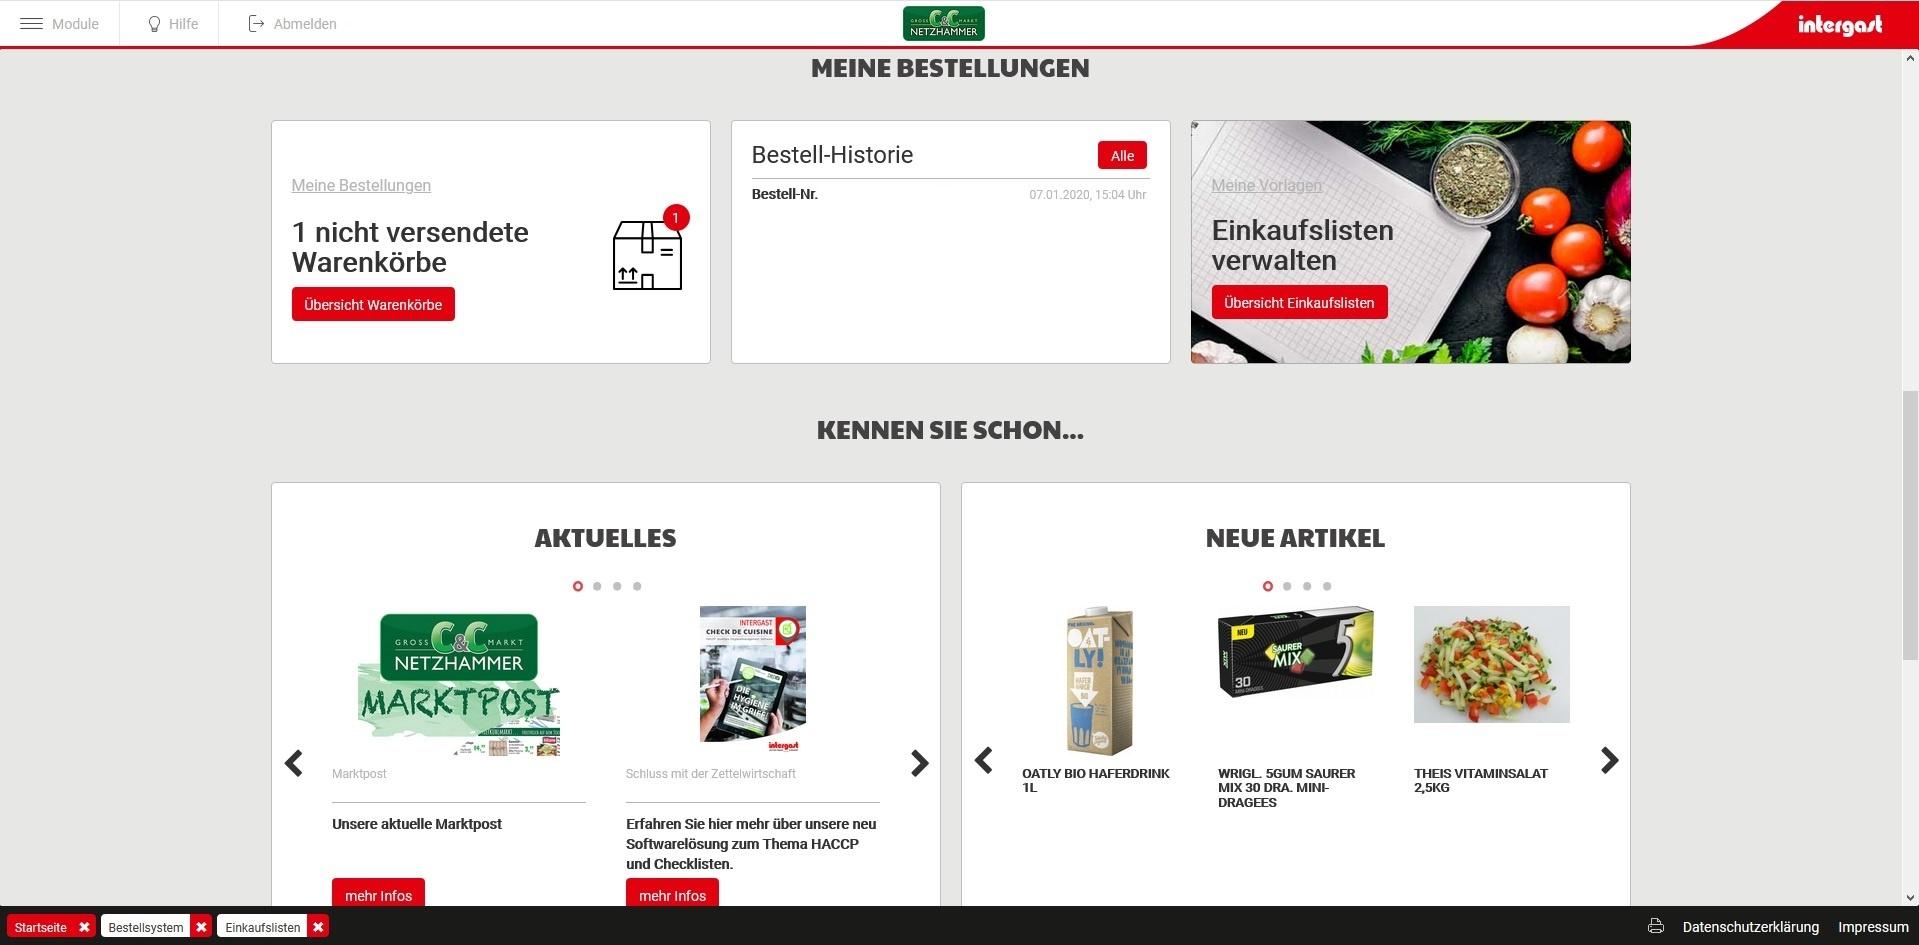 Service Webshop Bestellungen